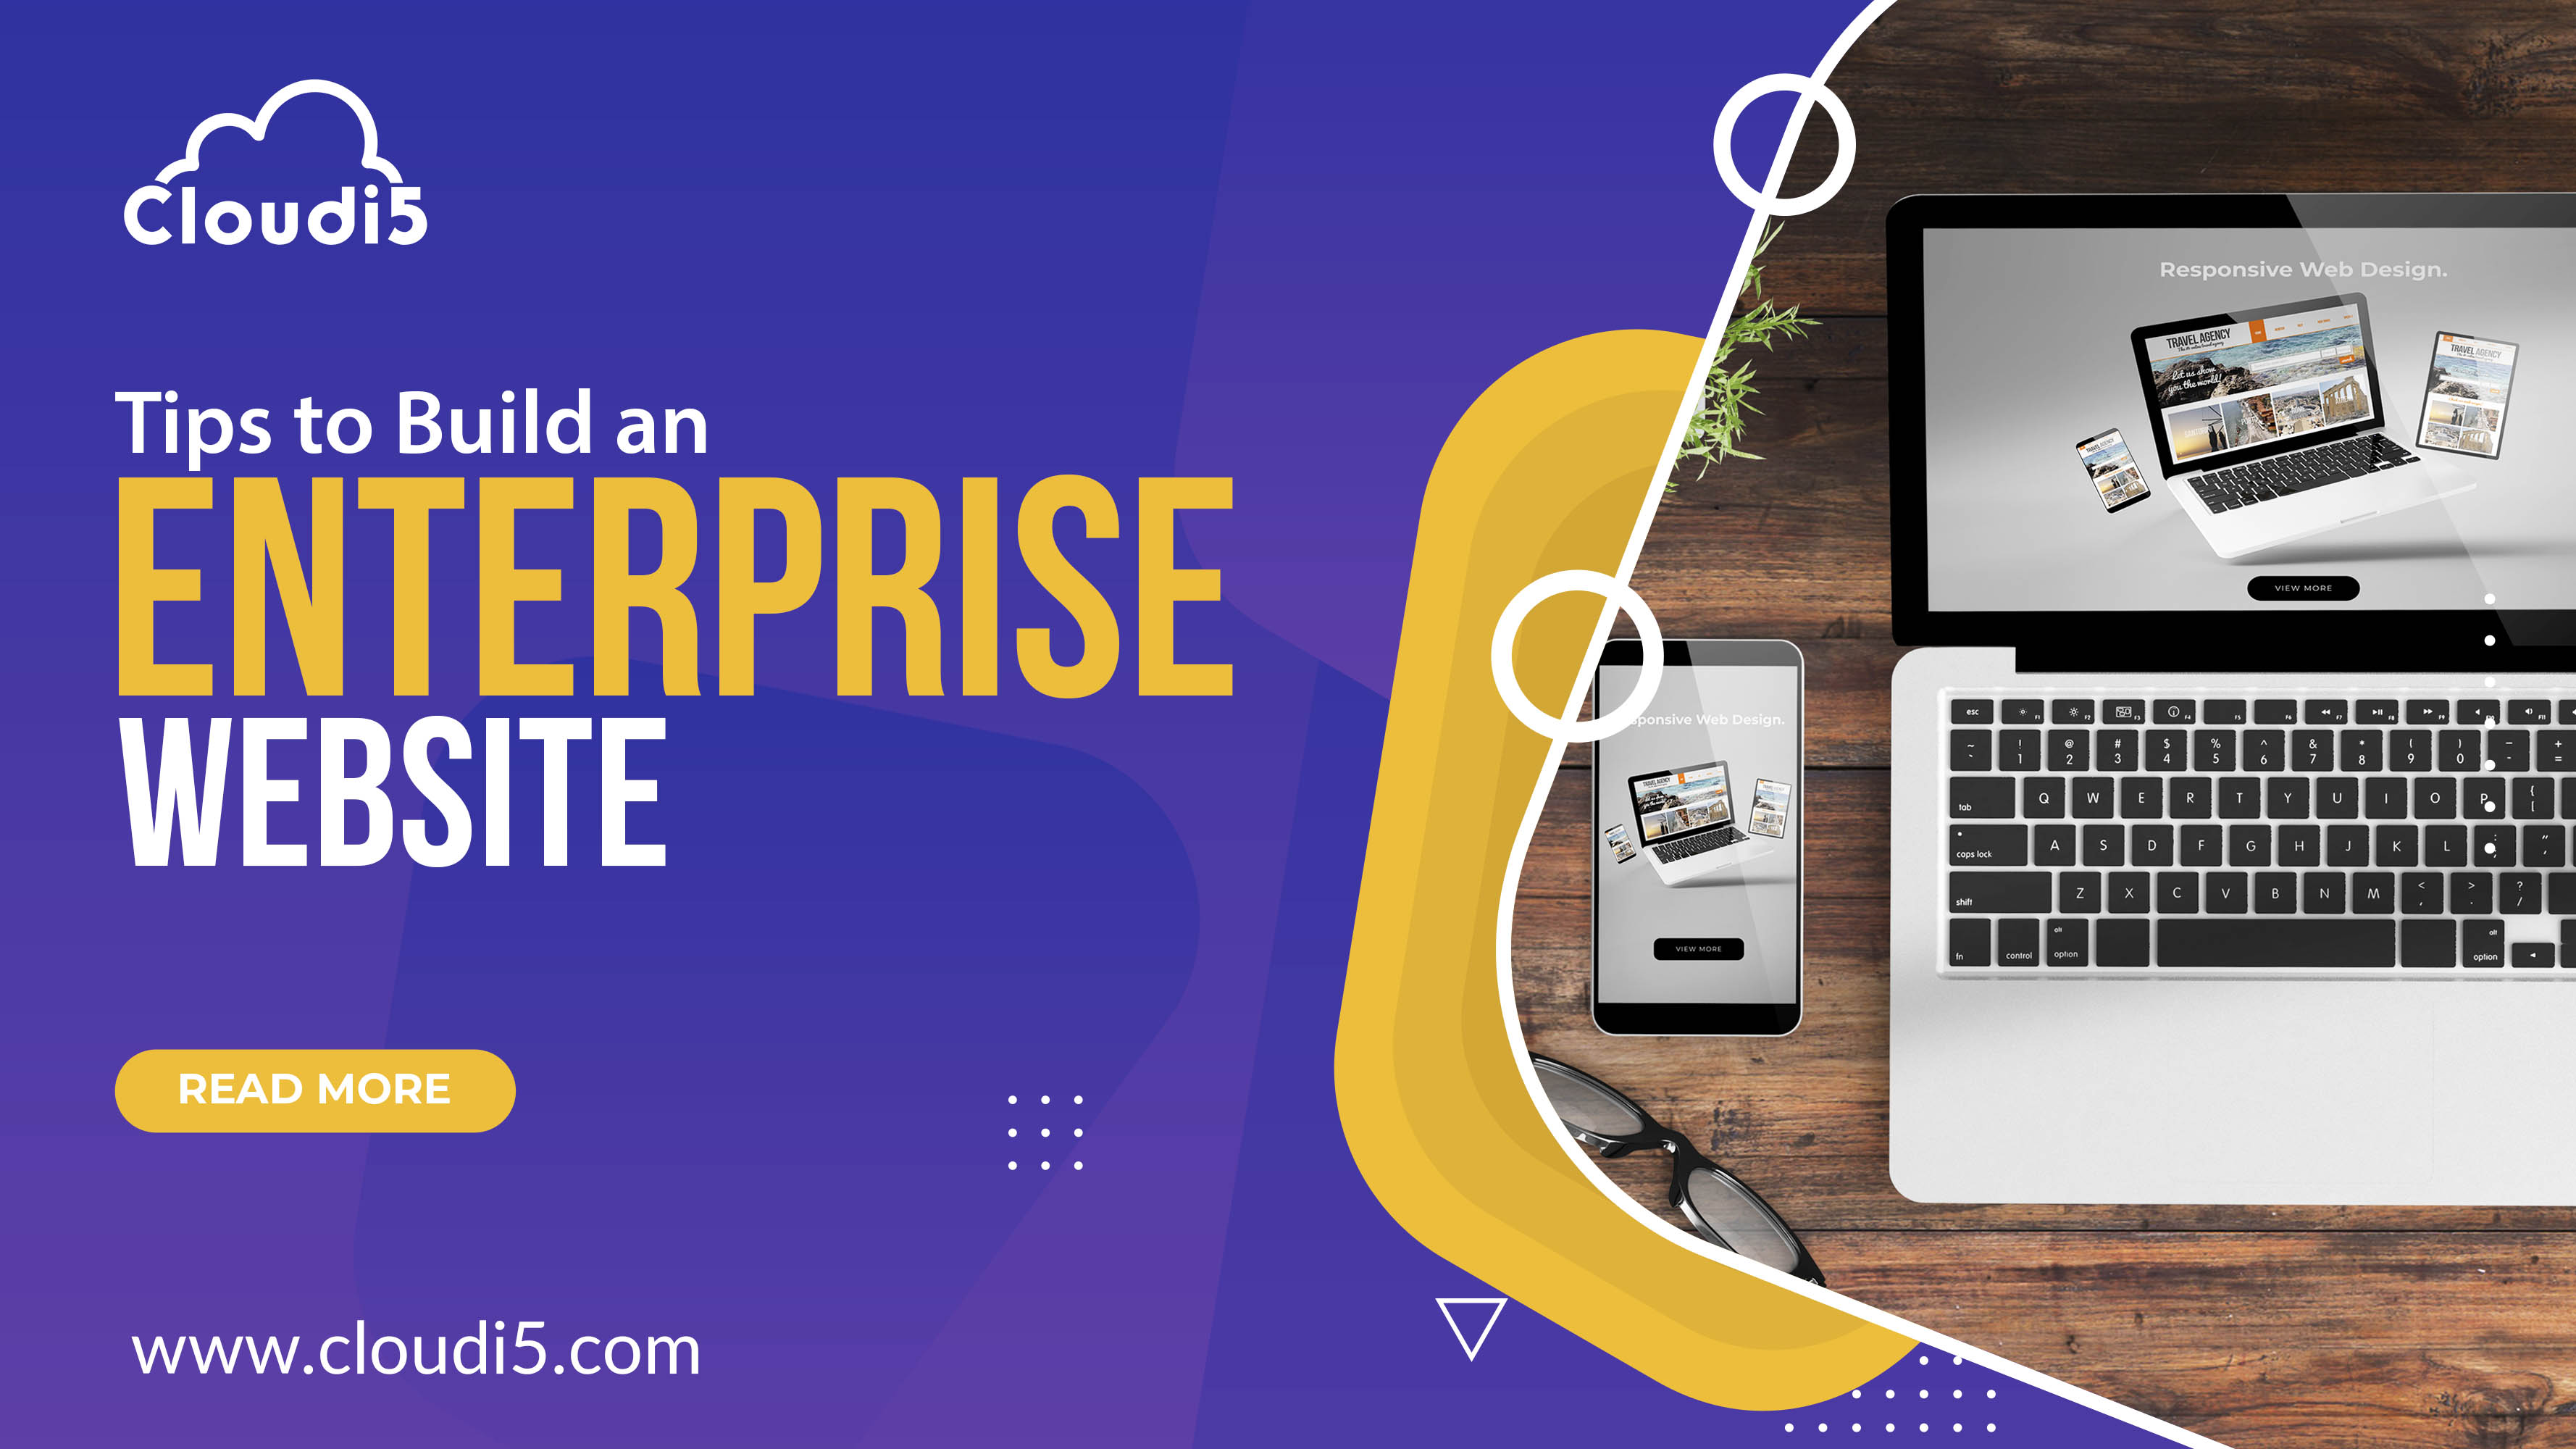 Tips to Build an Enterprise Website